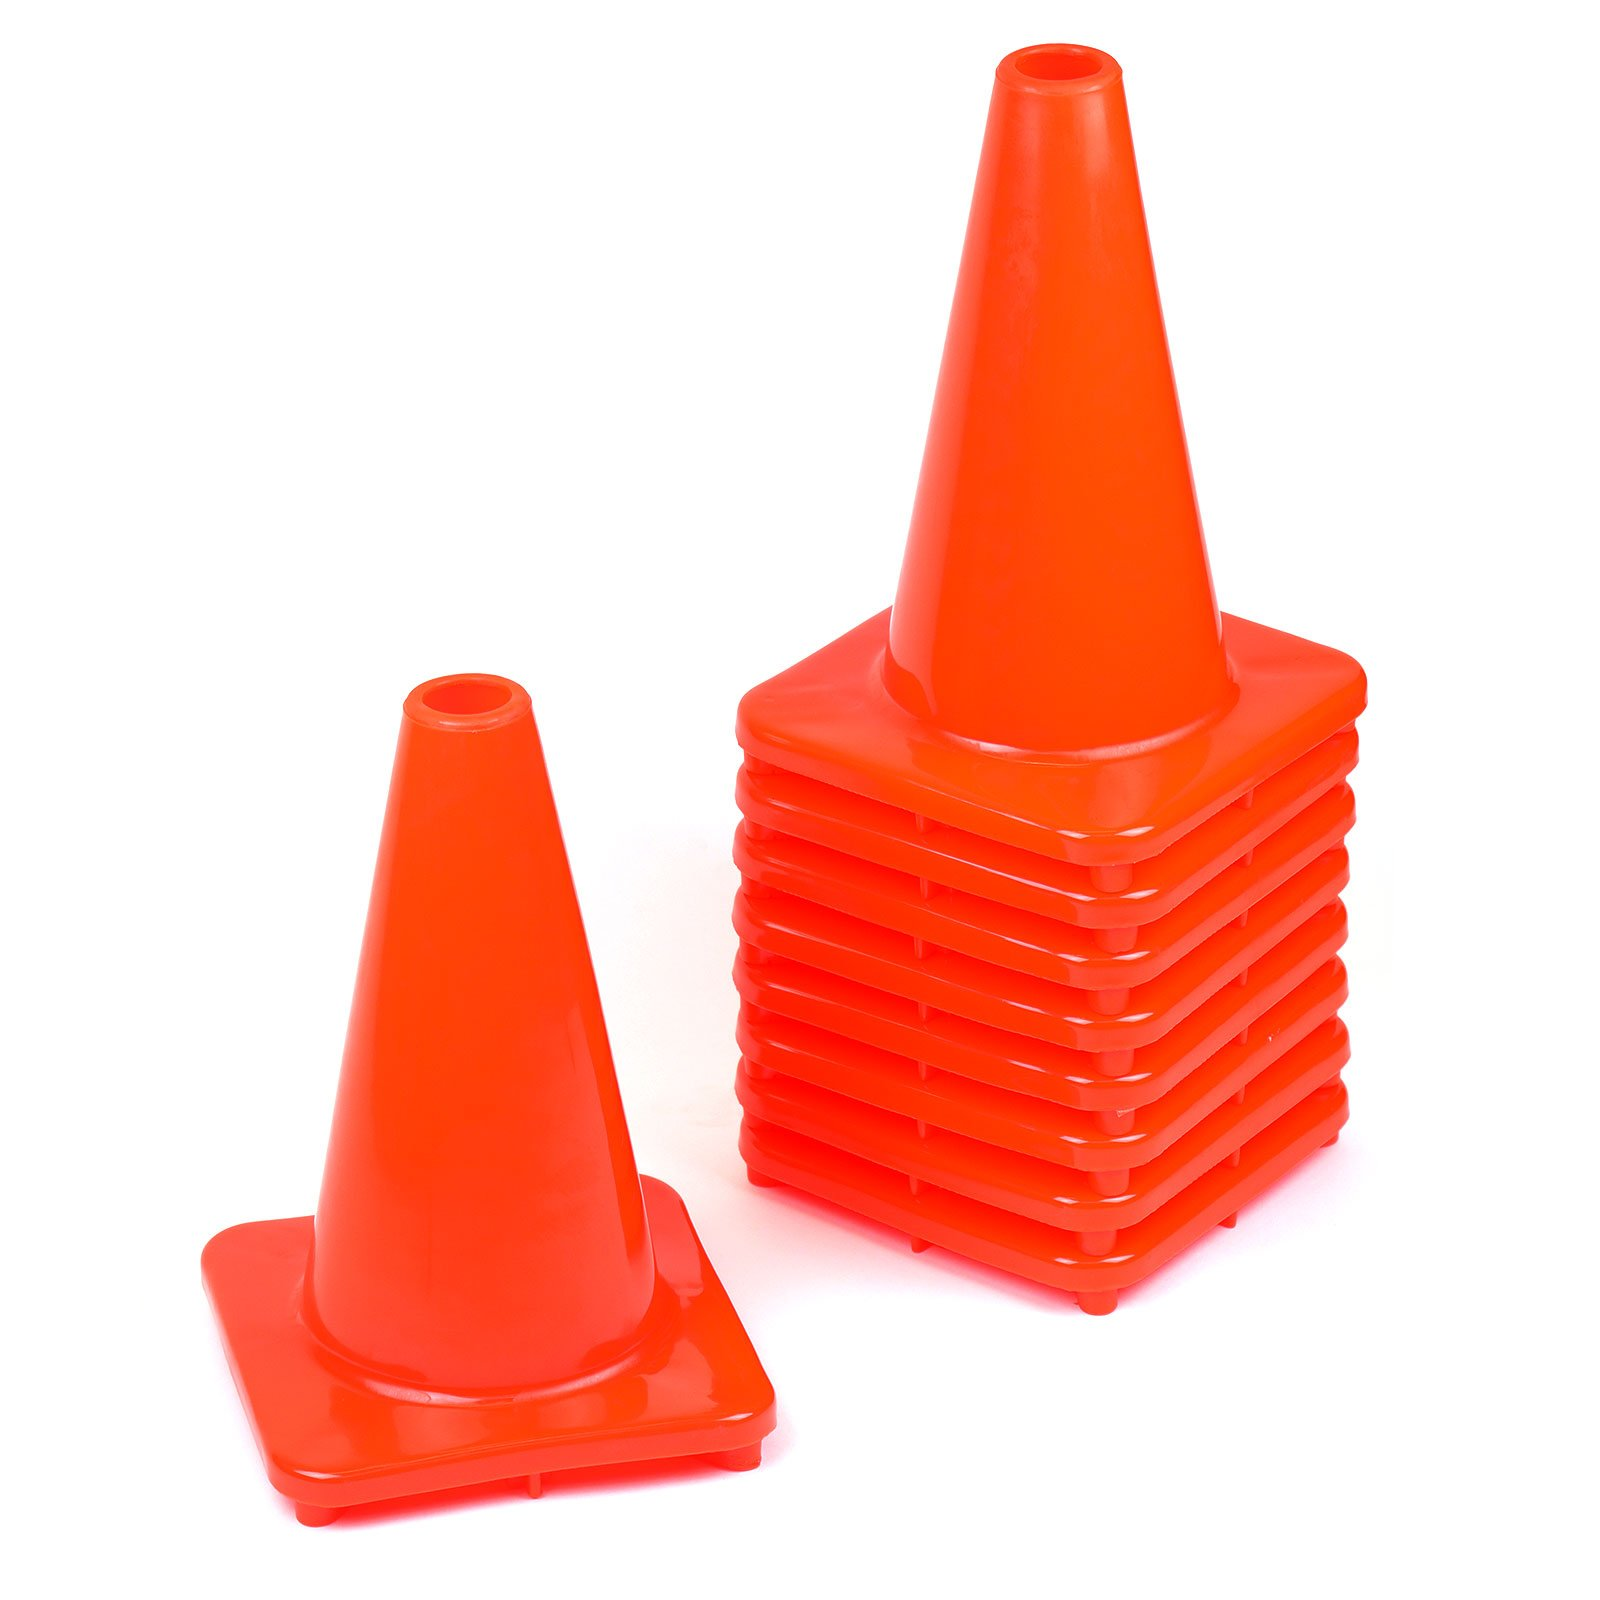 (Set of 40) RK PVC Traffic Safety Cone, Orange, 12-Inch